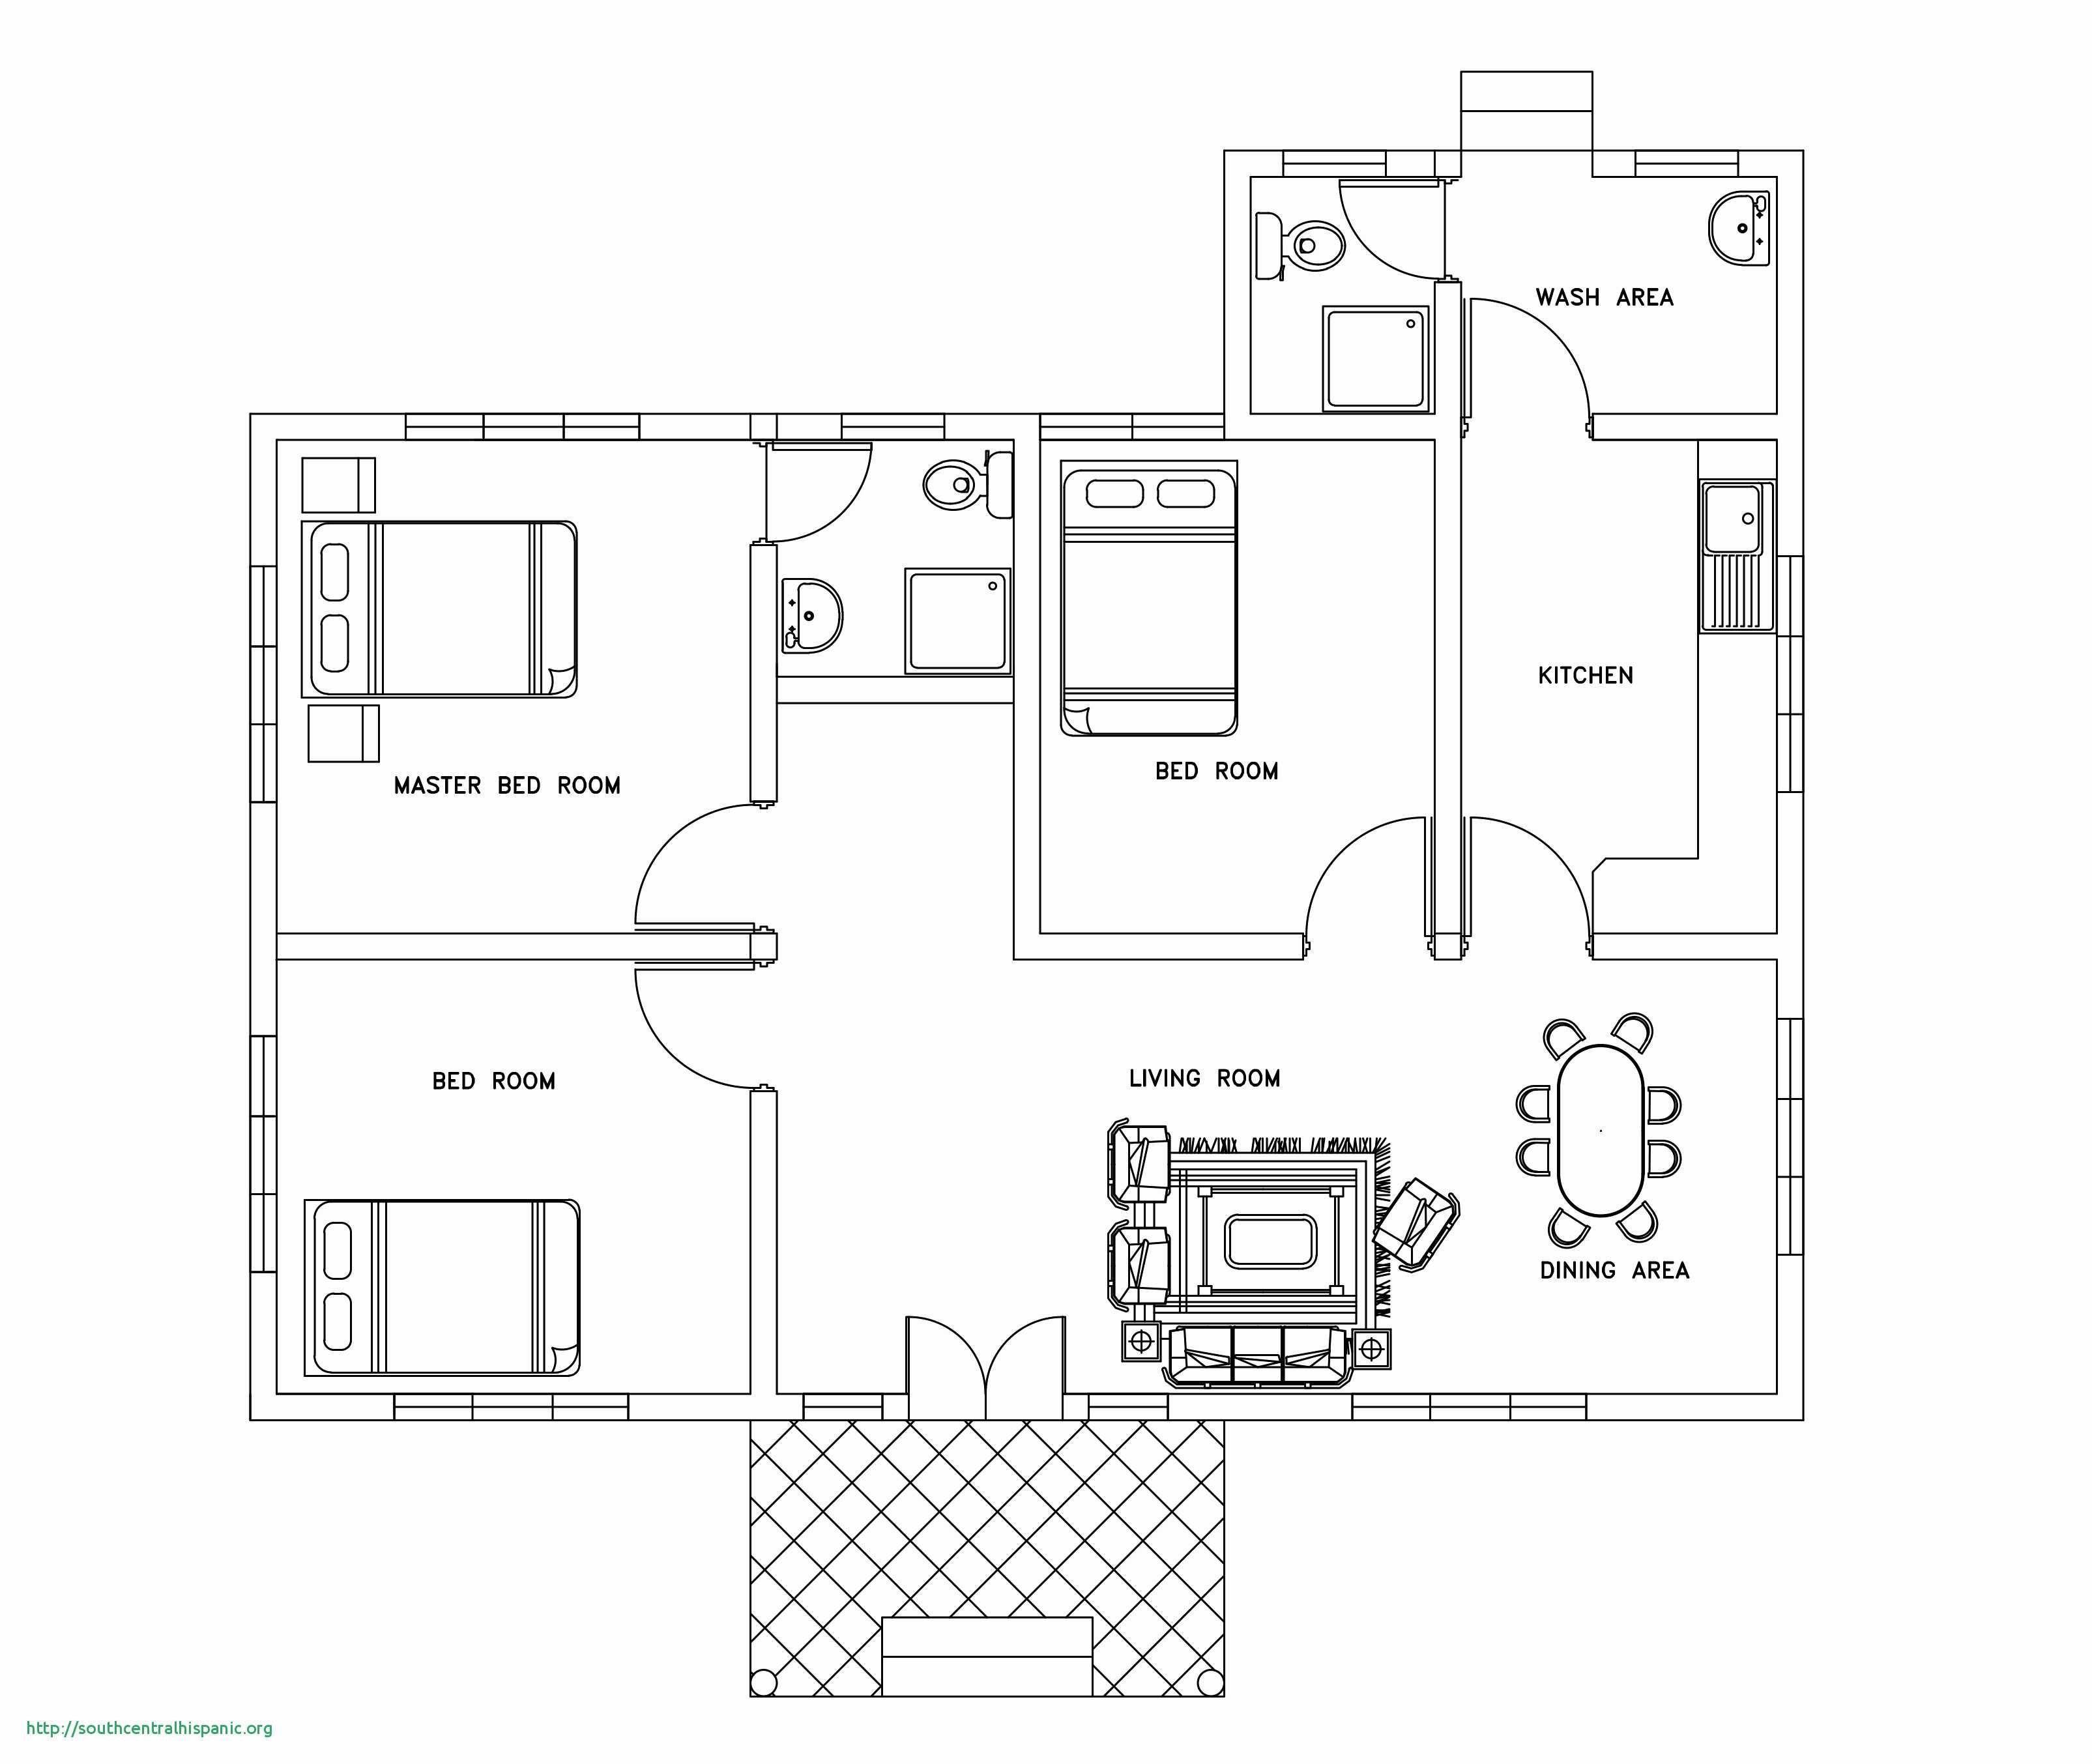 Bedroom Floor Plan Symbols Floor Plan Design Free House Plans Bedroom House Plans